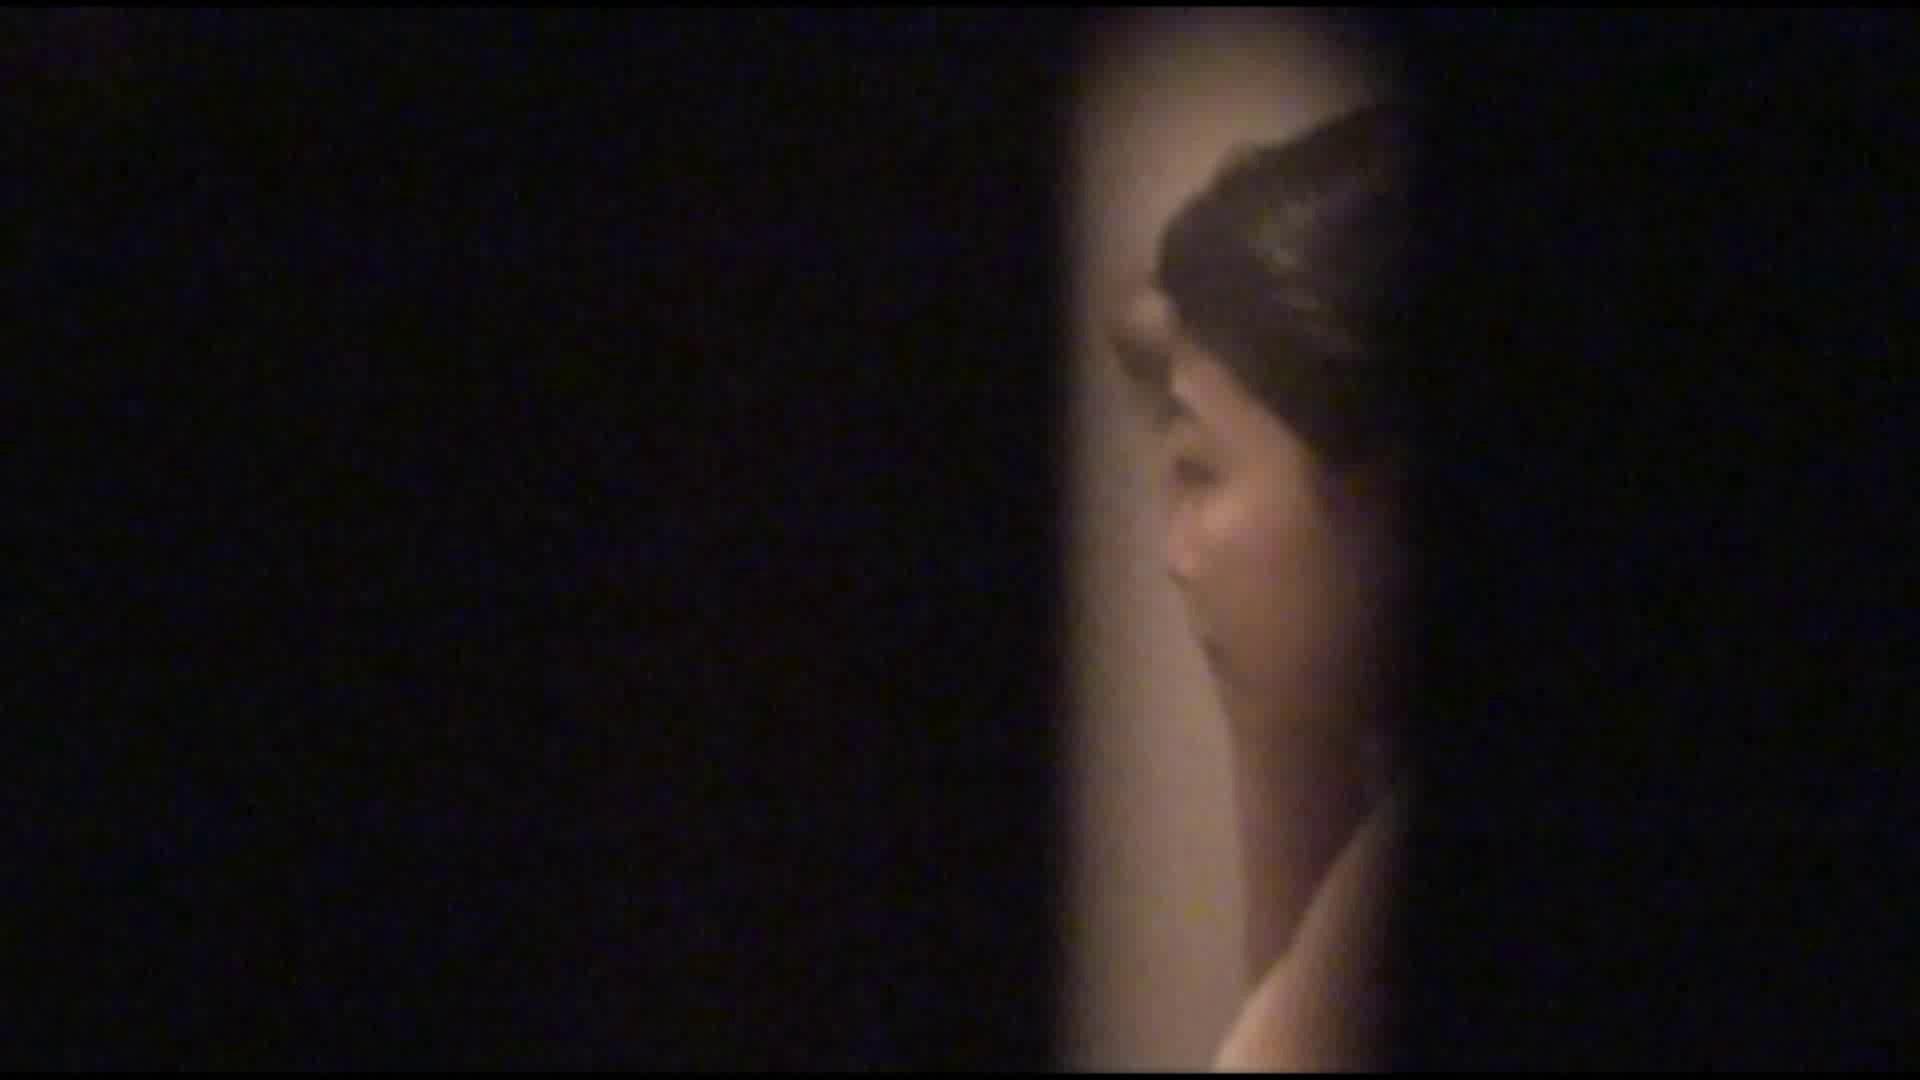 vol.05最高の極上美人!可愛い彼女の裸体をどうぞ!風呂上り鏡チェックも必見! 美人  68pic 31